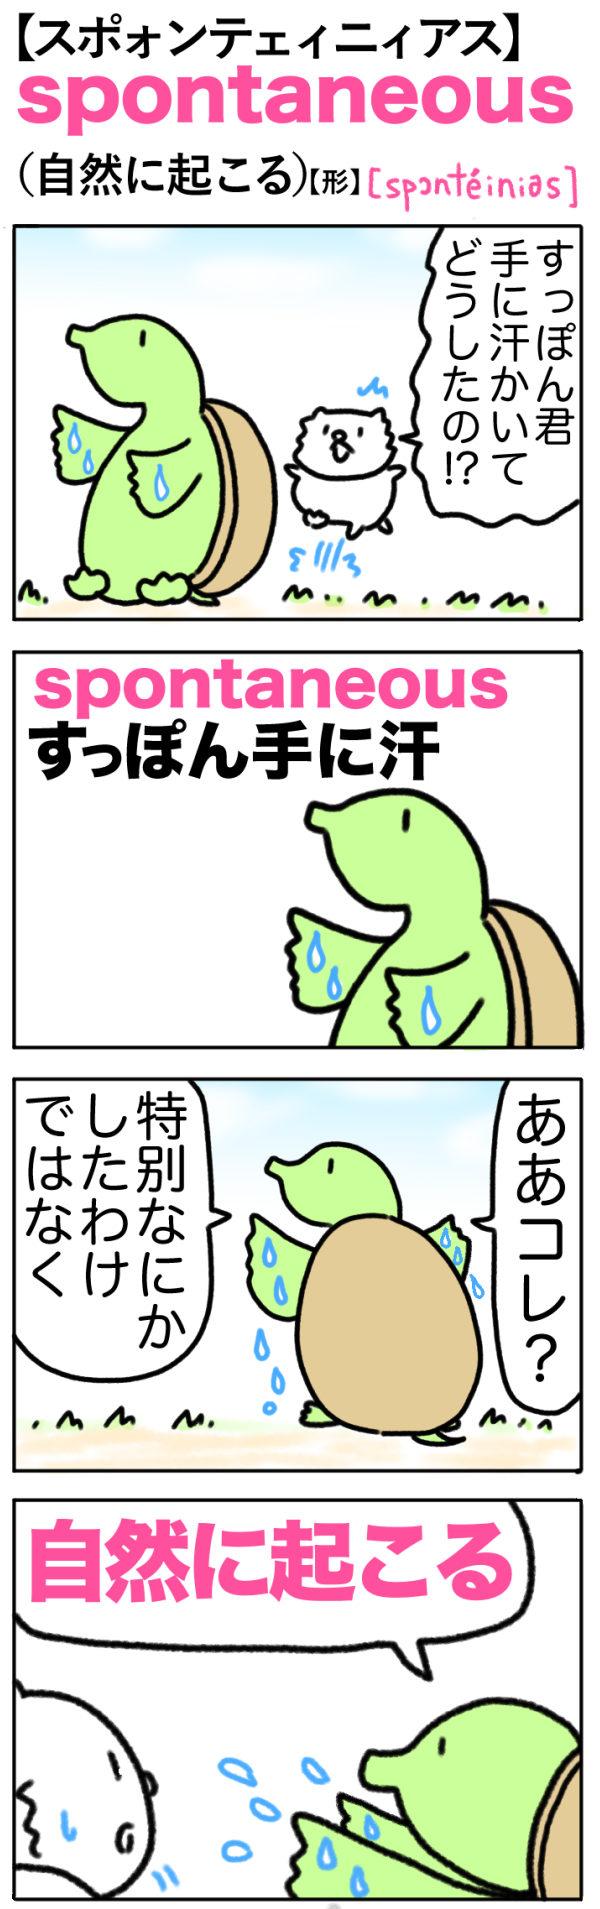 spontaneous(自然に起こる)の語呂合わせ英単語